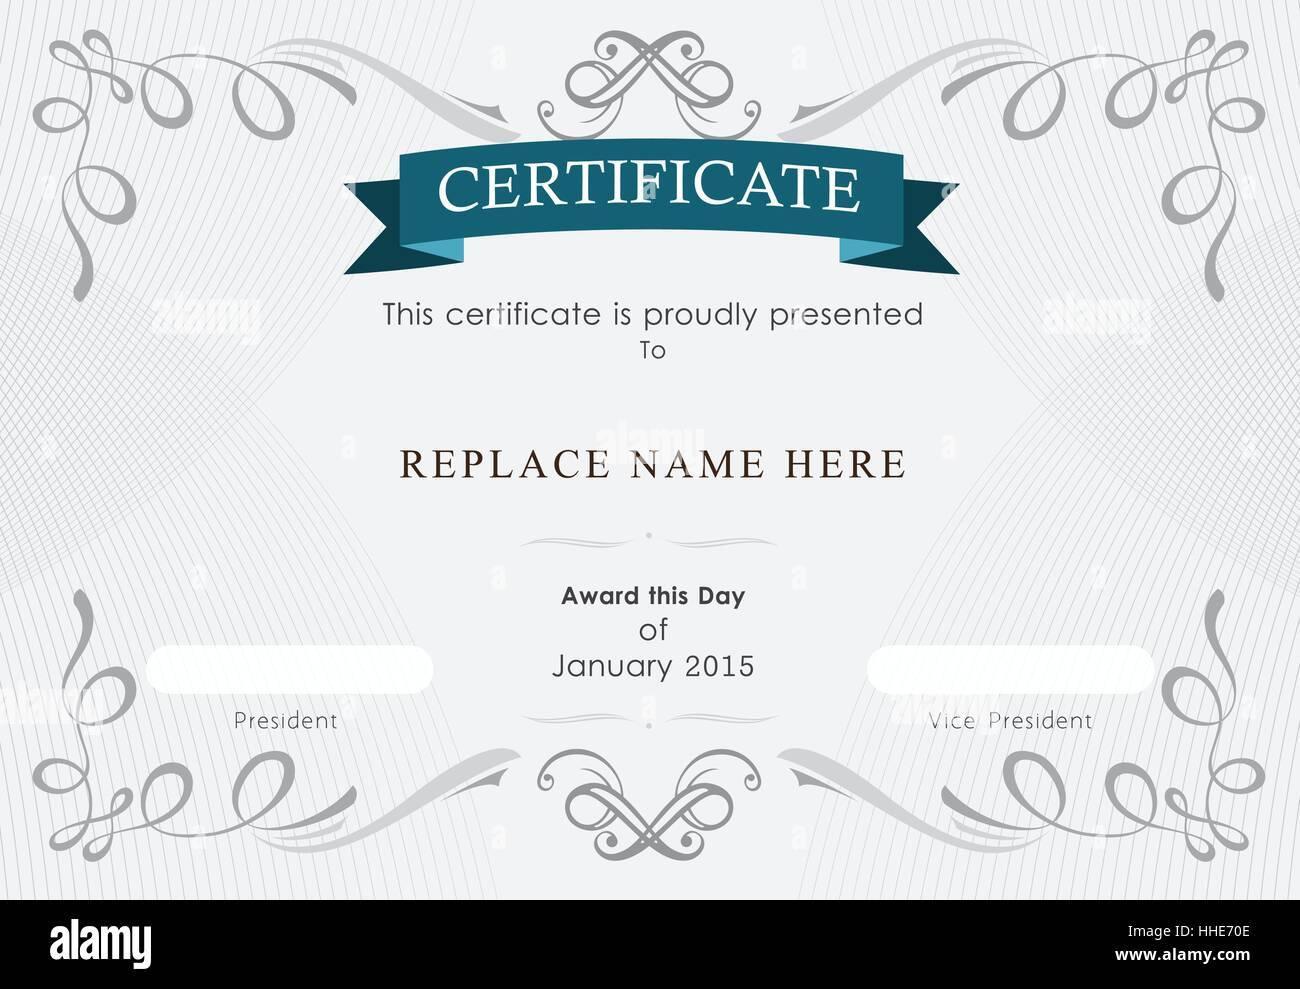 Certificate Frame Stockfotos & Certificate Frame Bilder - Alamy